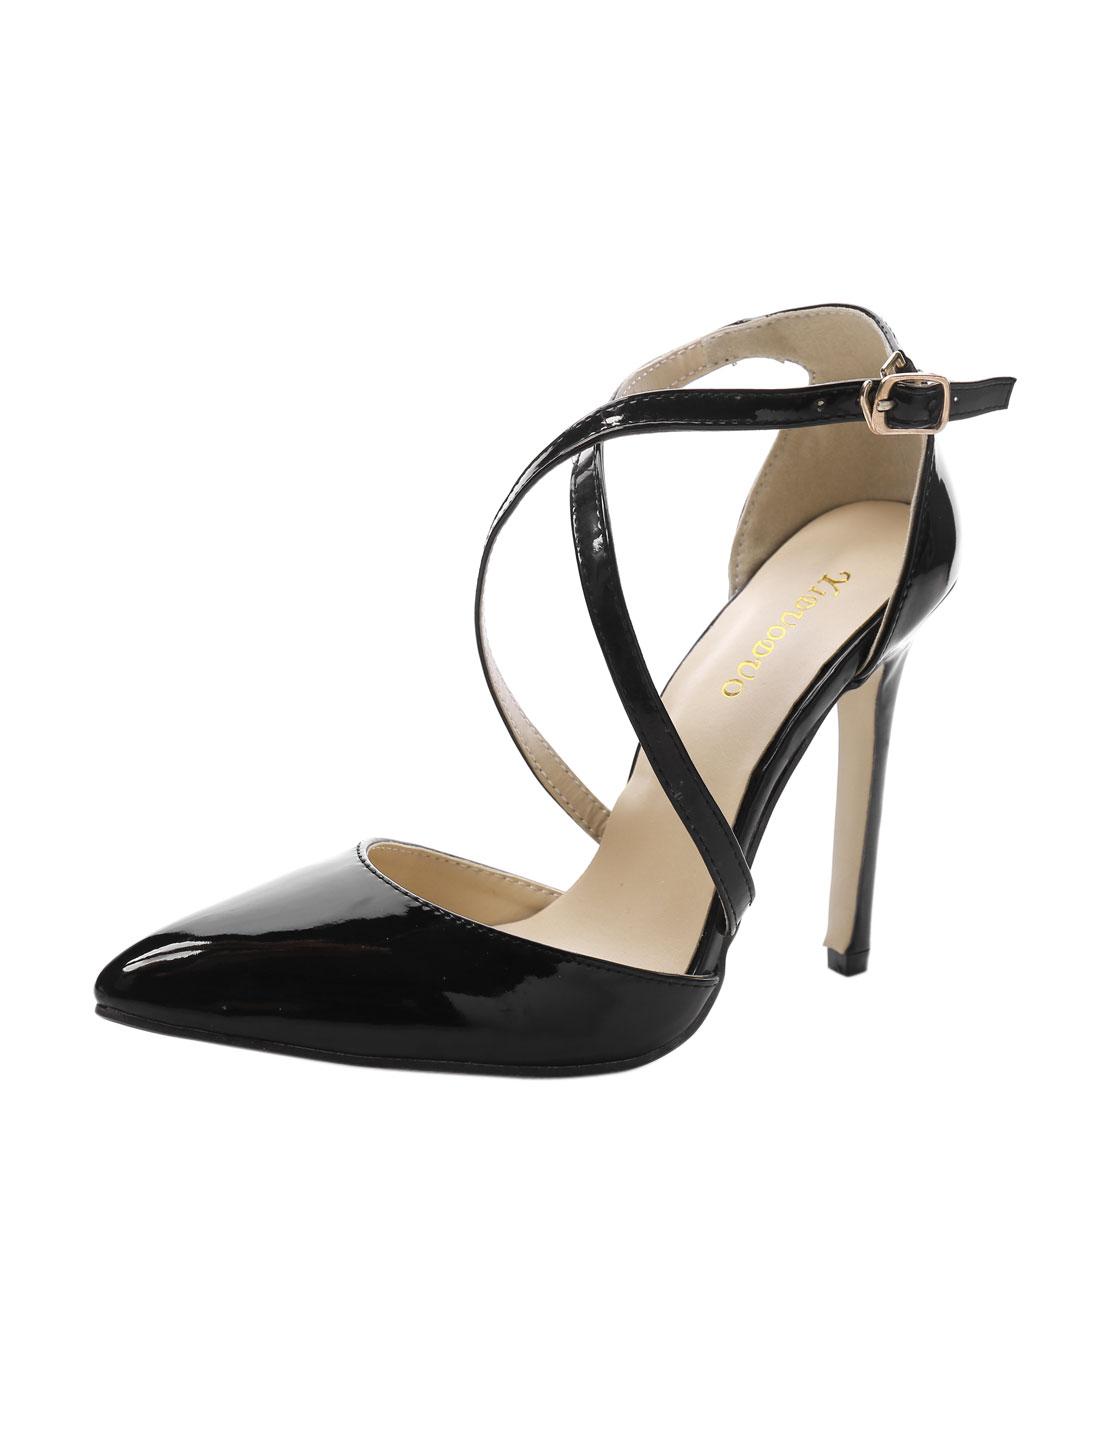 Lady Point Toe Crisscross Straps High Heels Black US 8